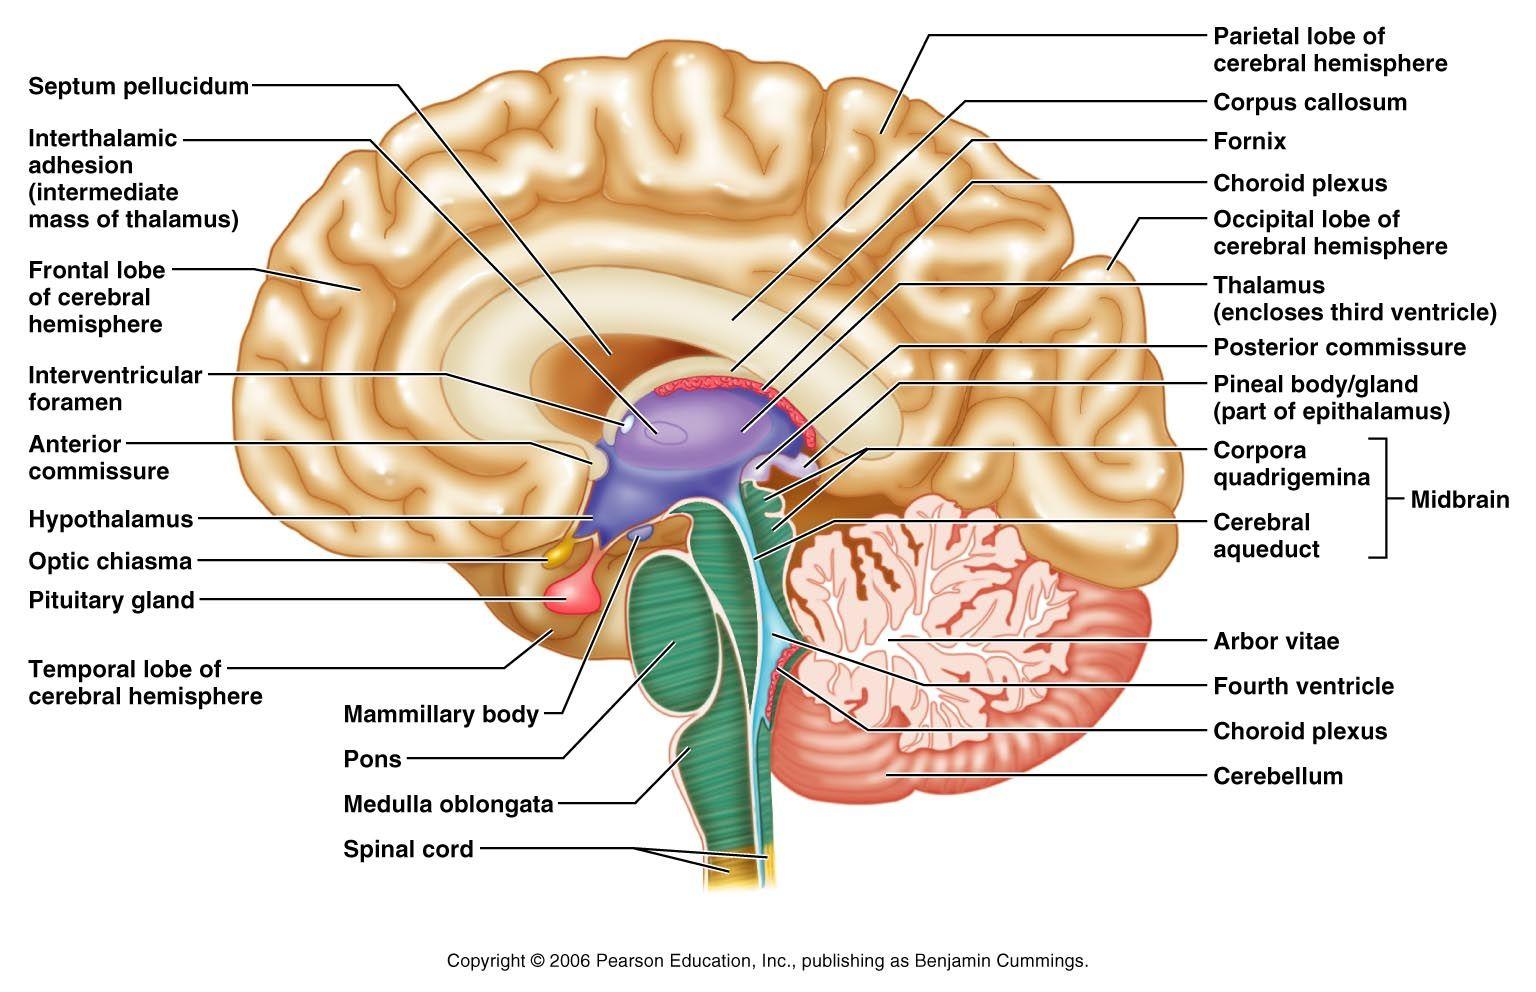 Sagittal Section Of The Brain Thalamus Hypothalamus Optic Chasm Pituitary Gland Pons